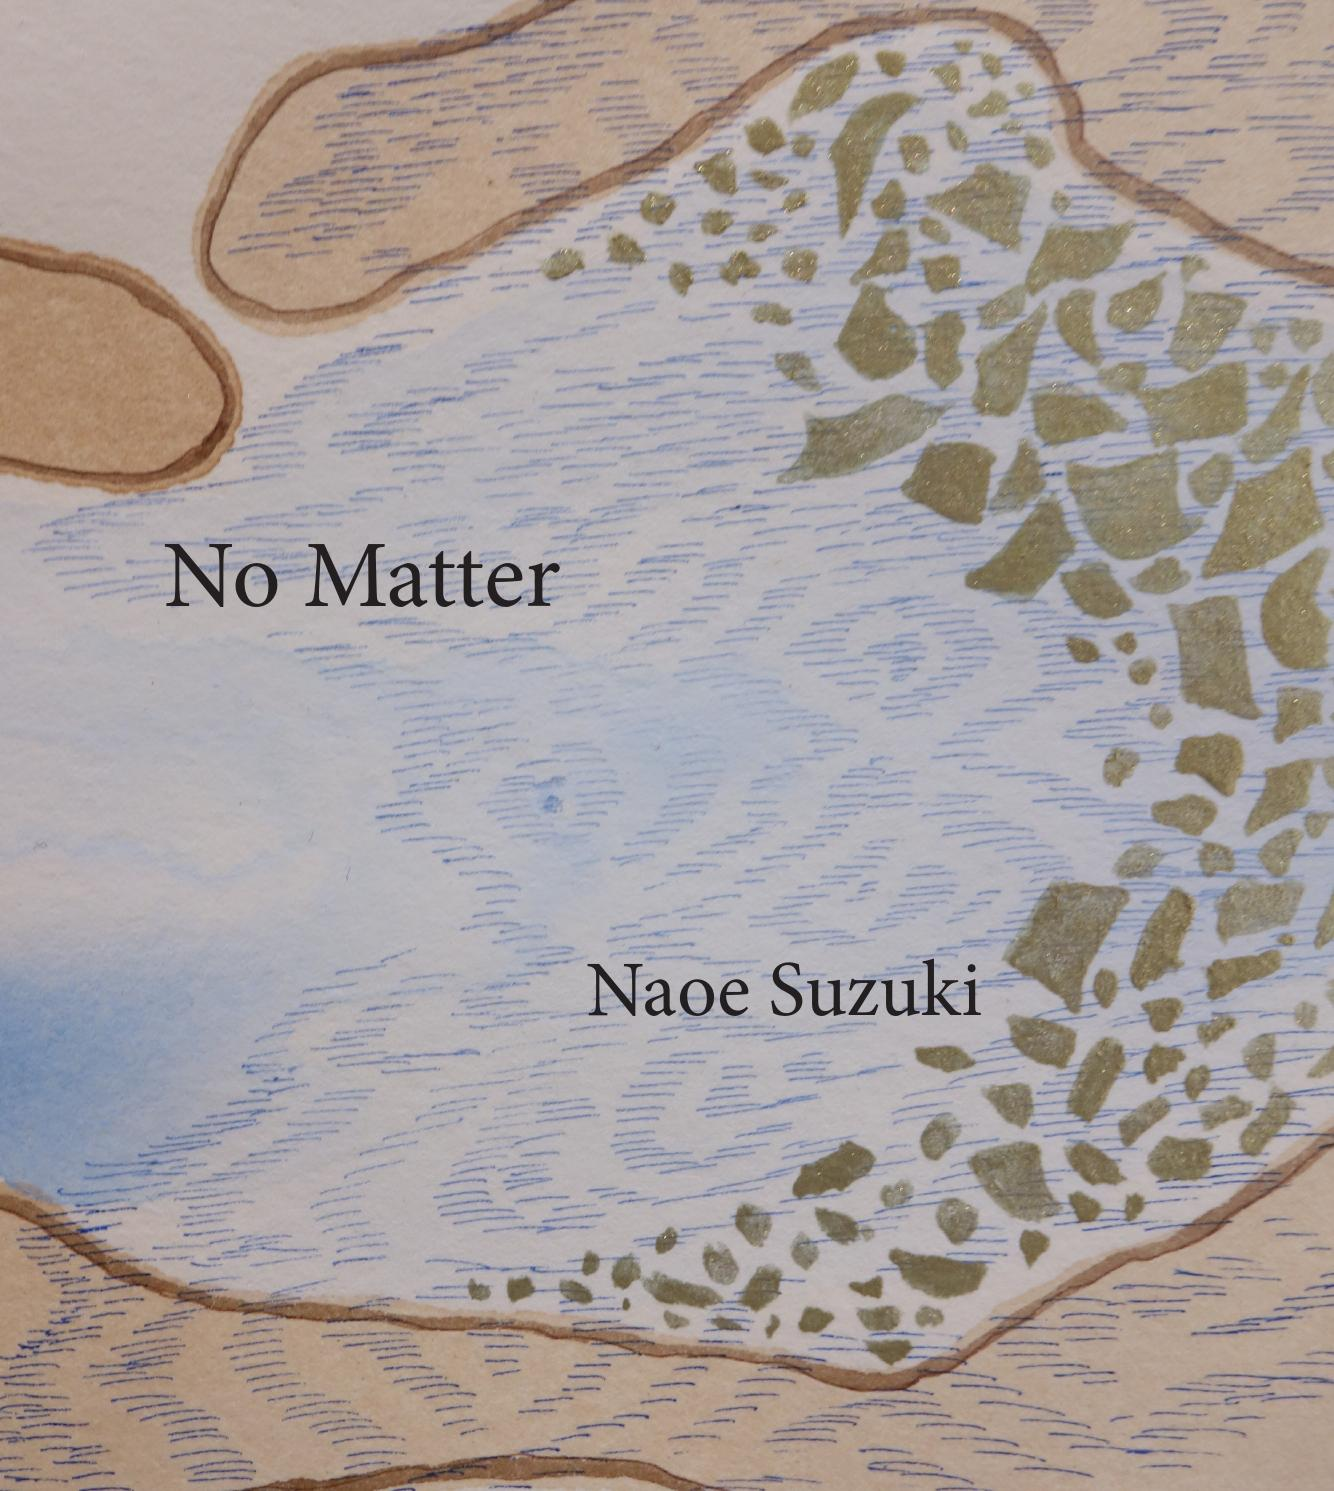 No matter: Naoe Suzuki by Naoe Suzuki - issuu